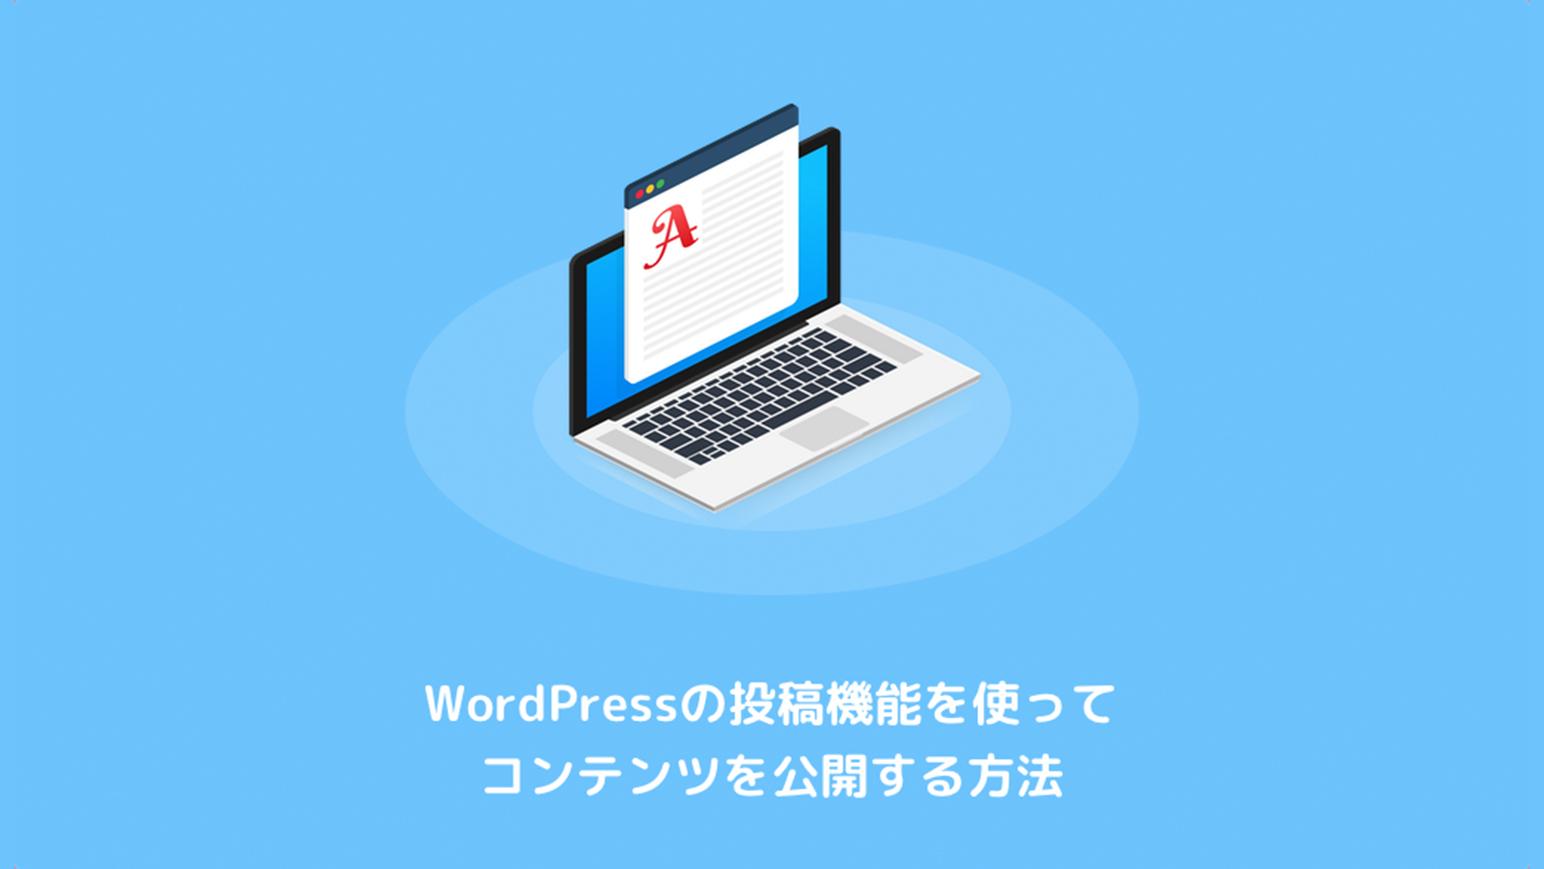 WordPressの投稿機能を使ってコンテンツを公開する方法のアイキャッチ